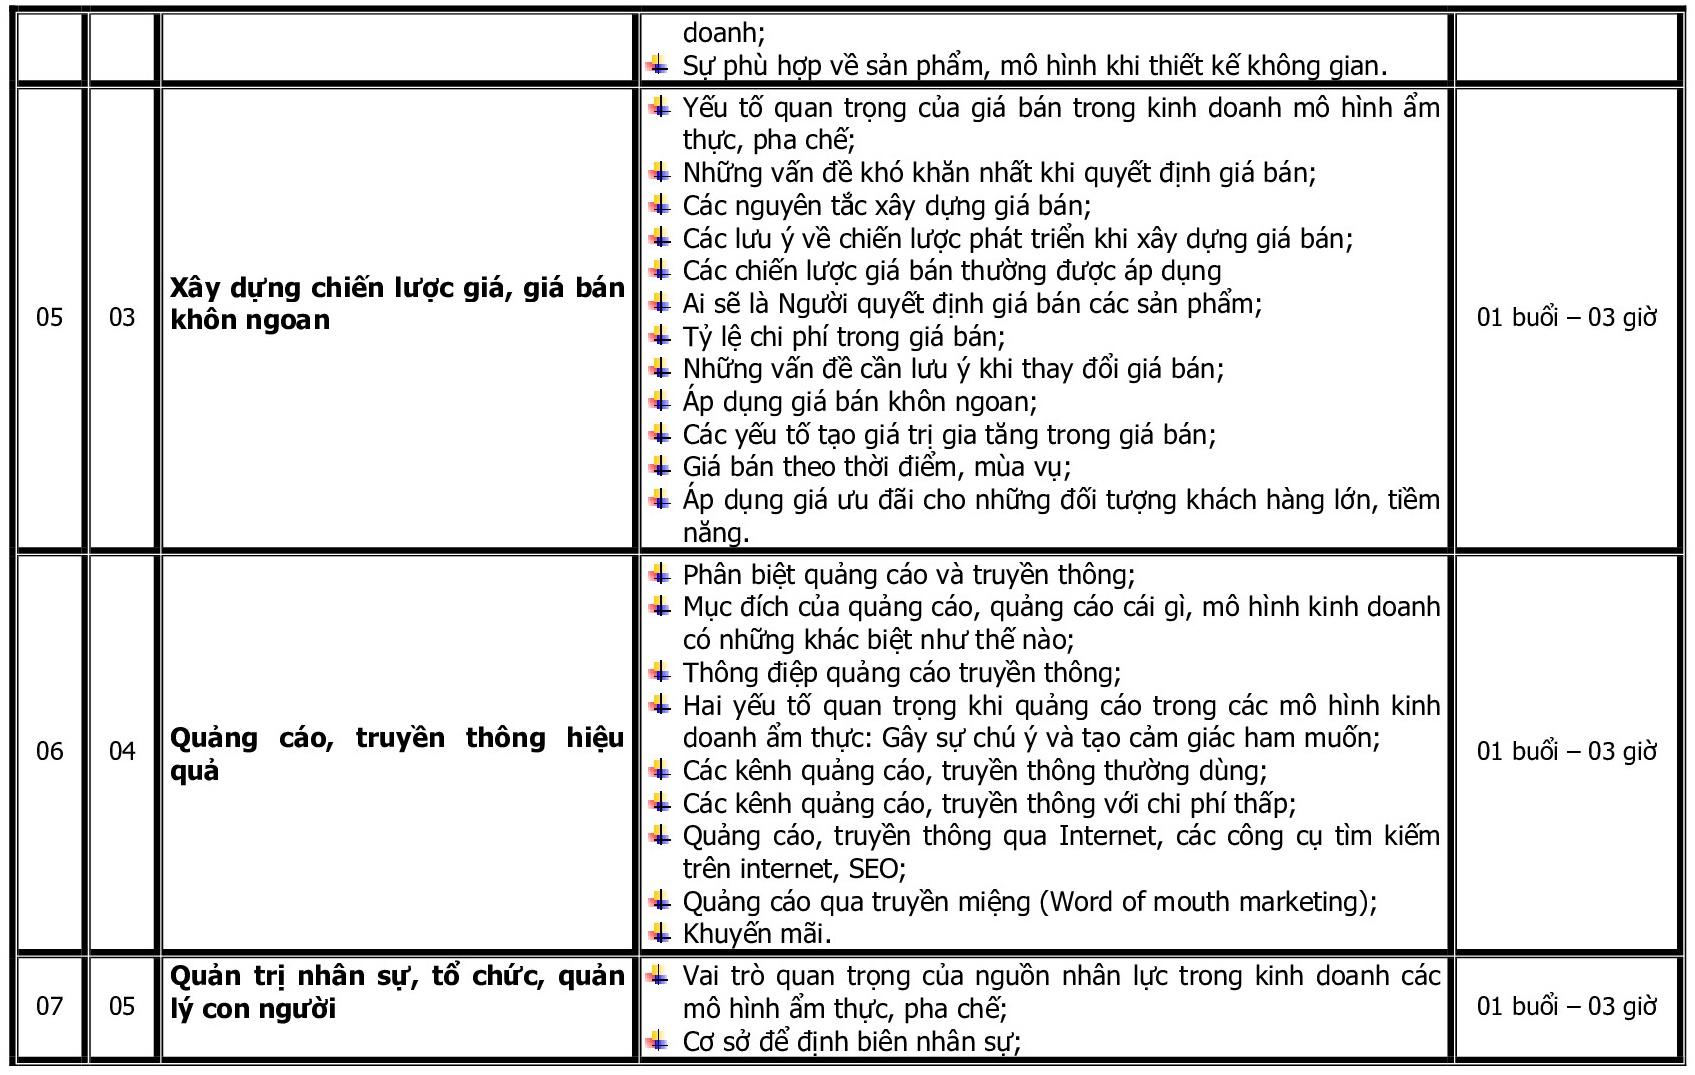 CT DAO TAO NGHIE VU BAR TRUONG_p003